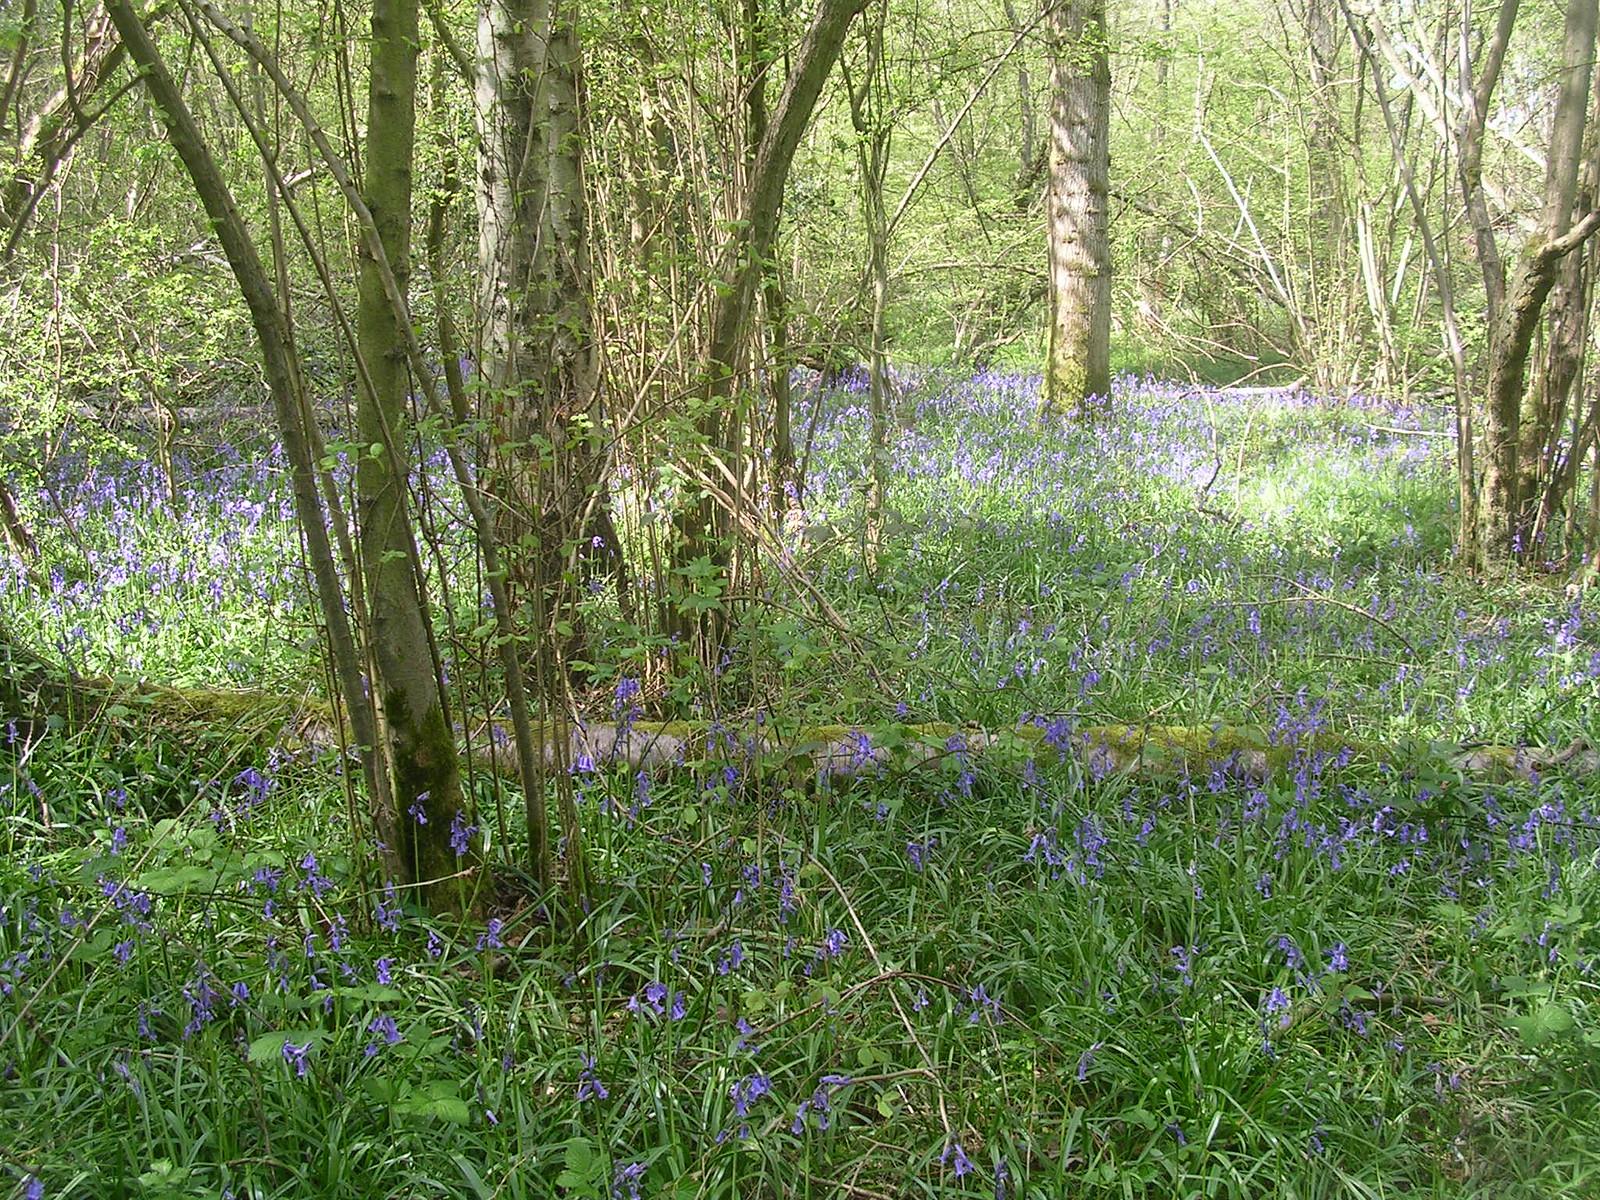 bluebells Yalding to Sevenoaks